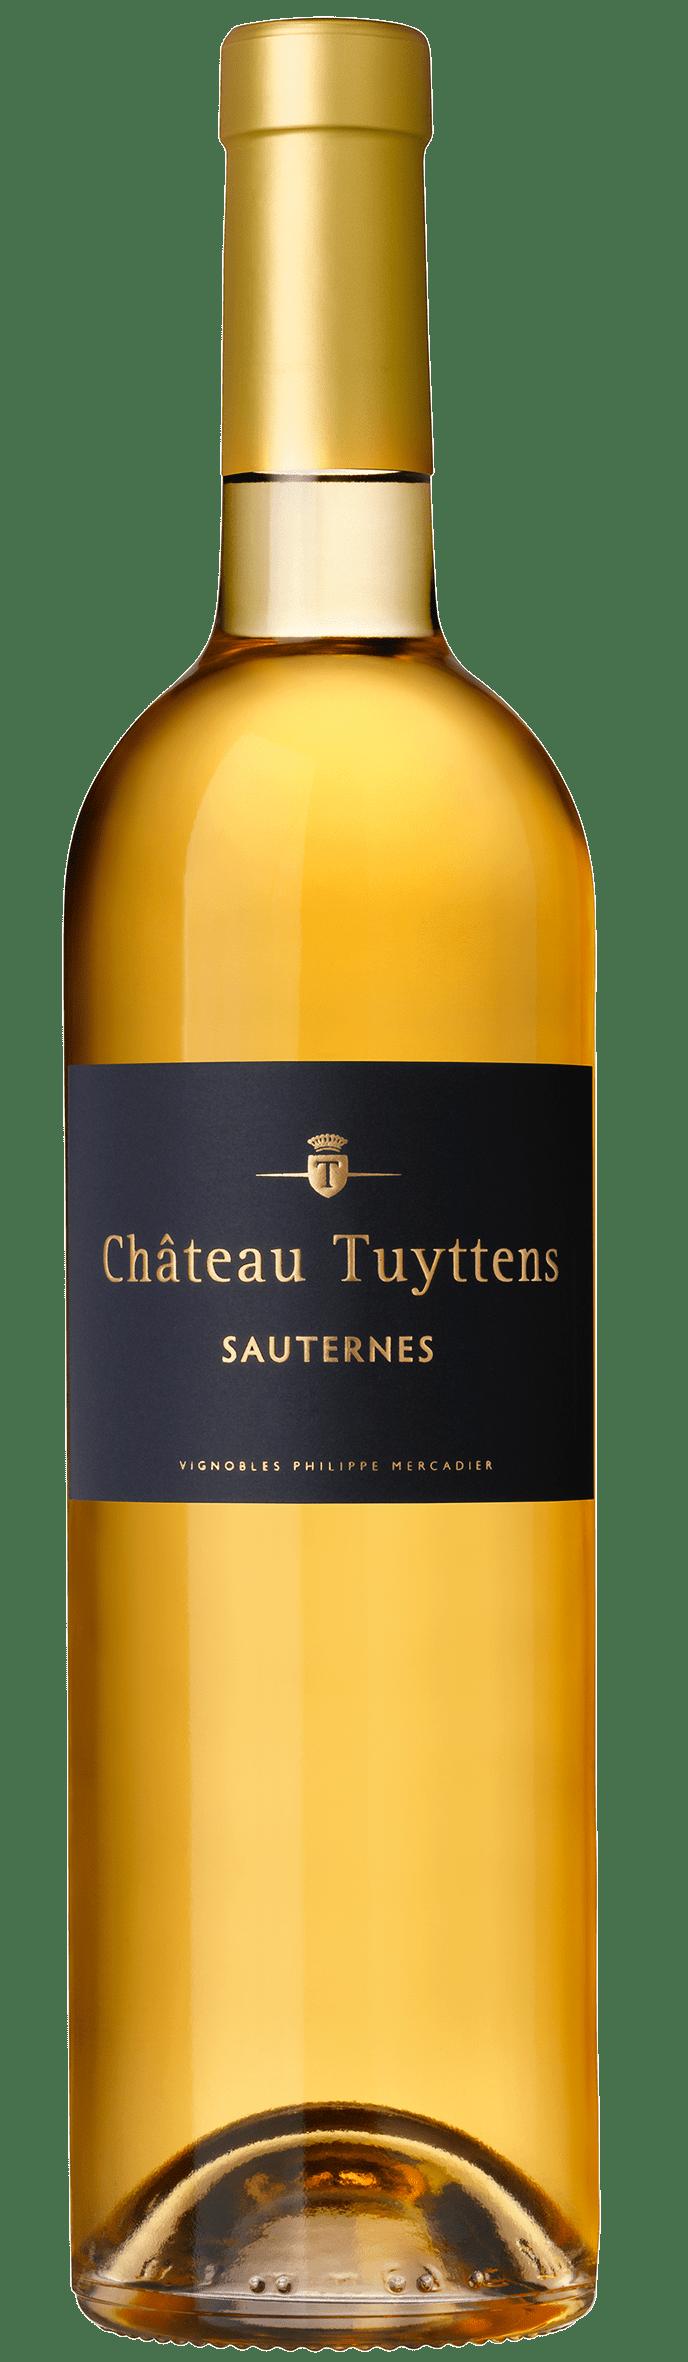 C-Tuyttens-vignobles-mercadier